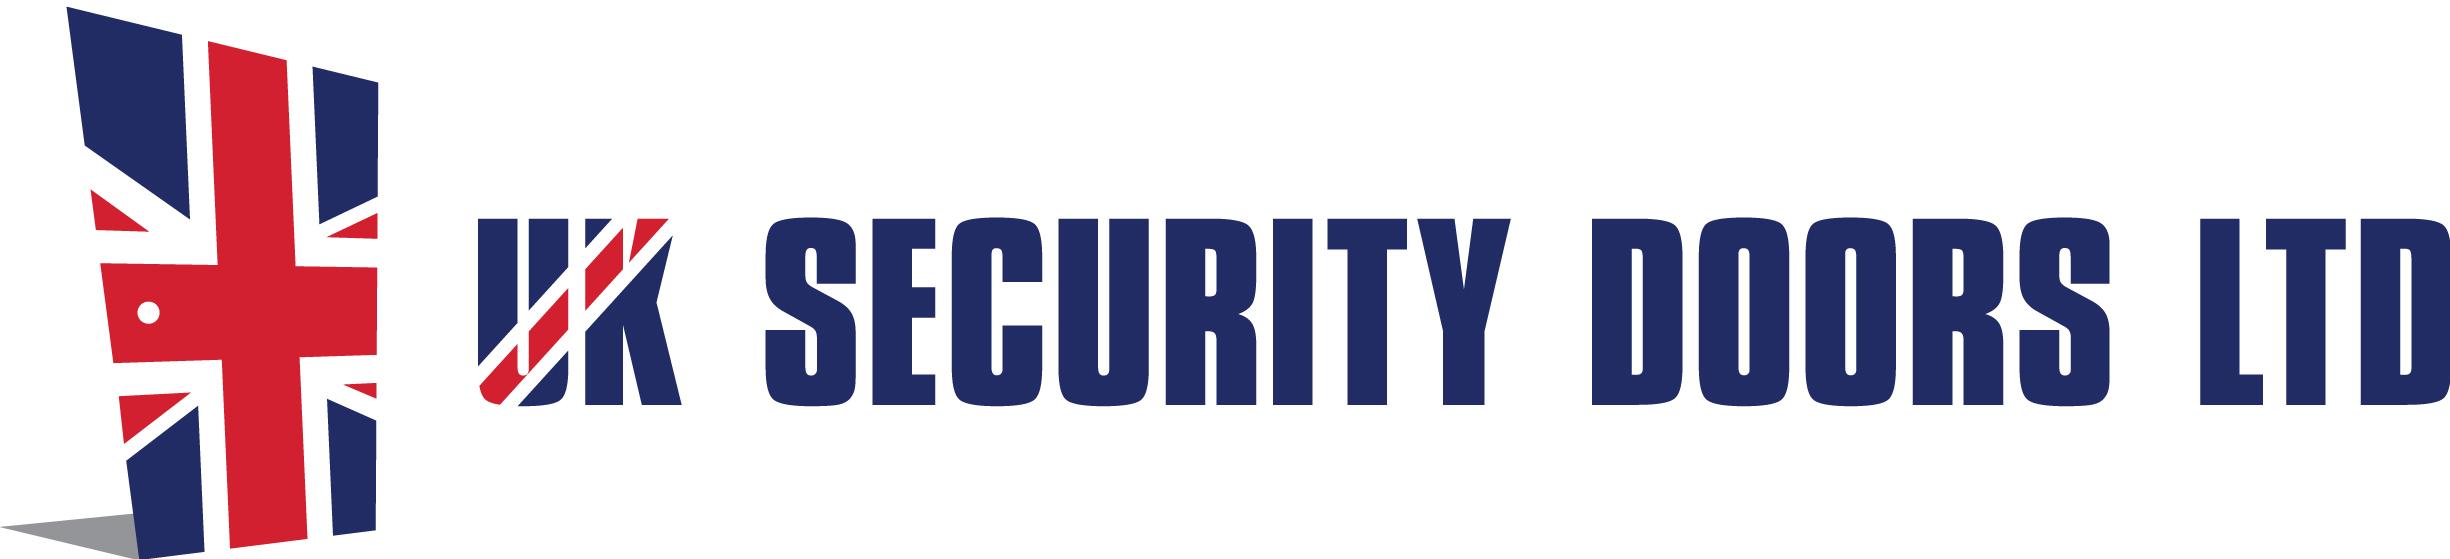 UK Security Doors logo 2